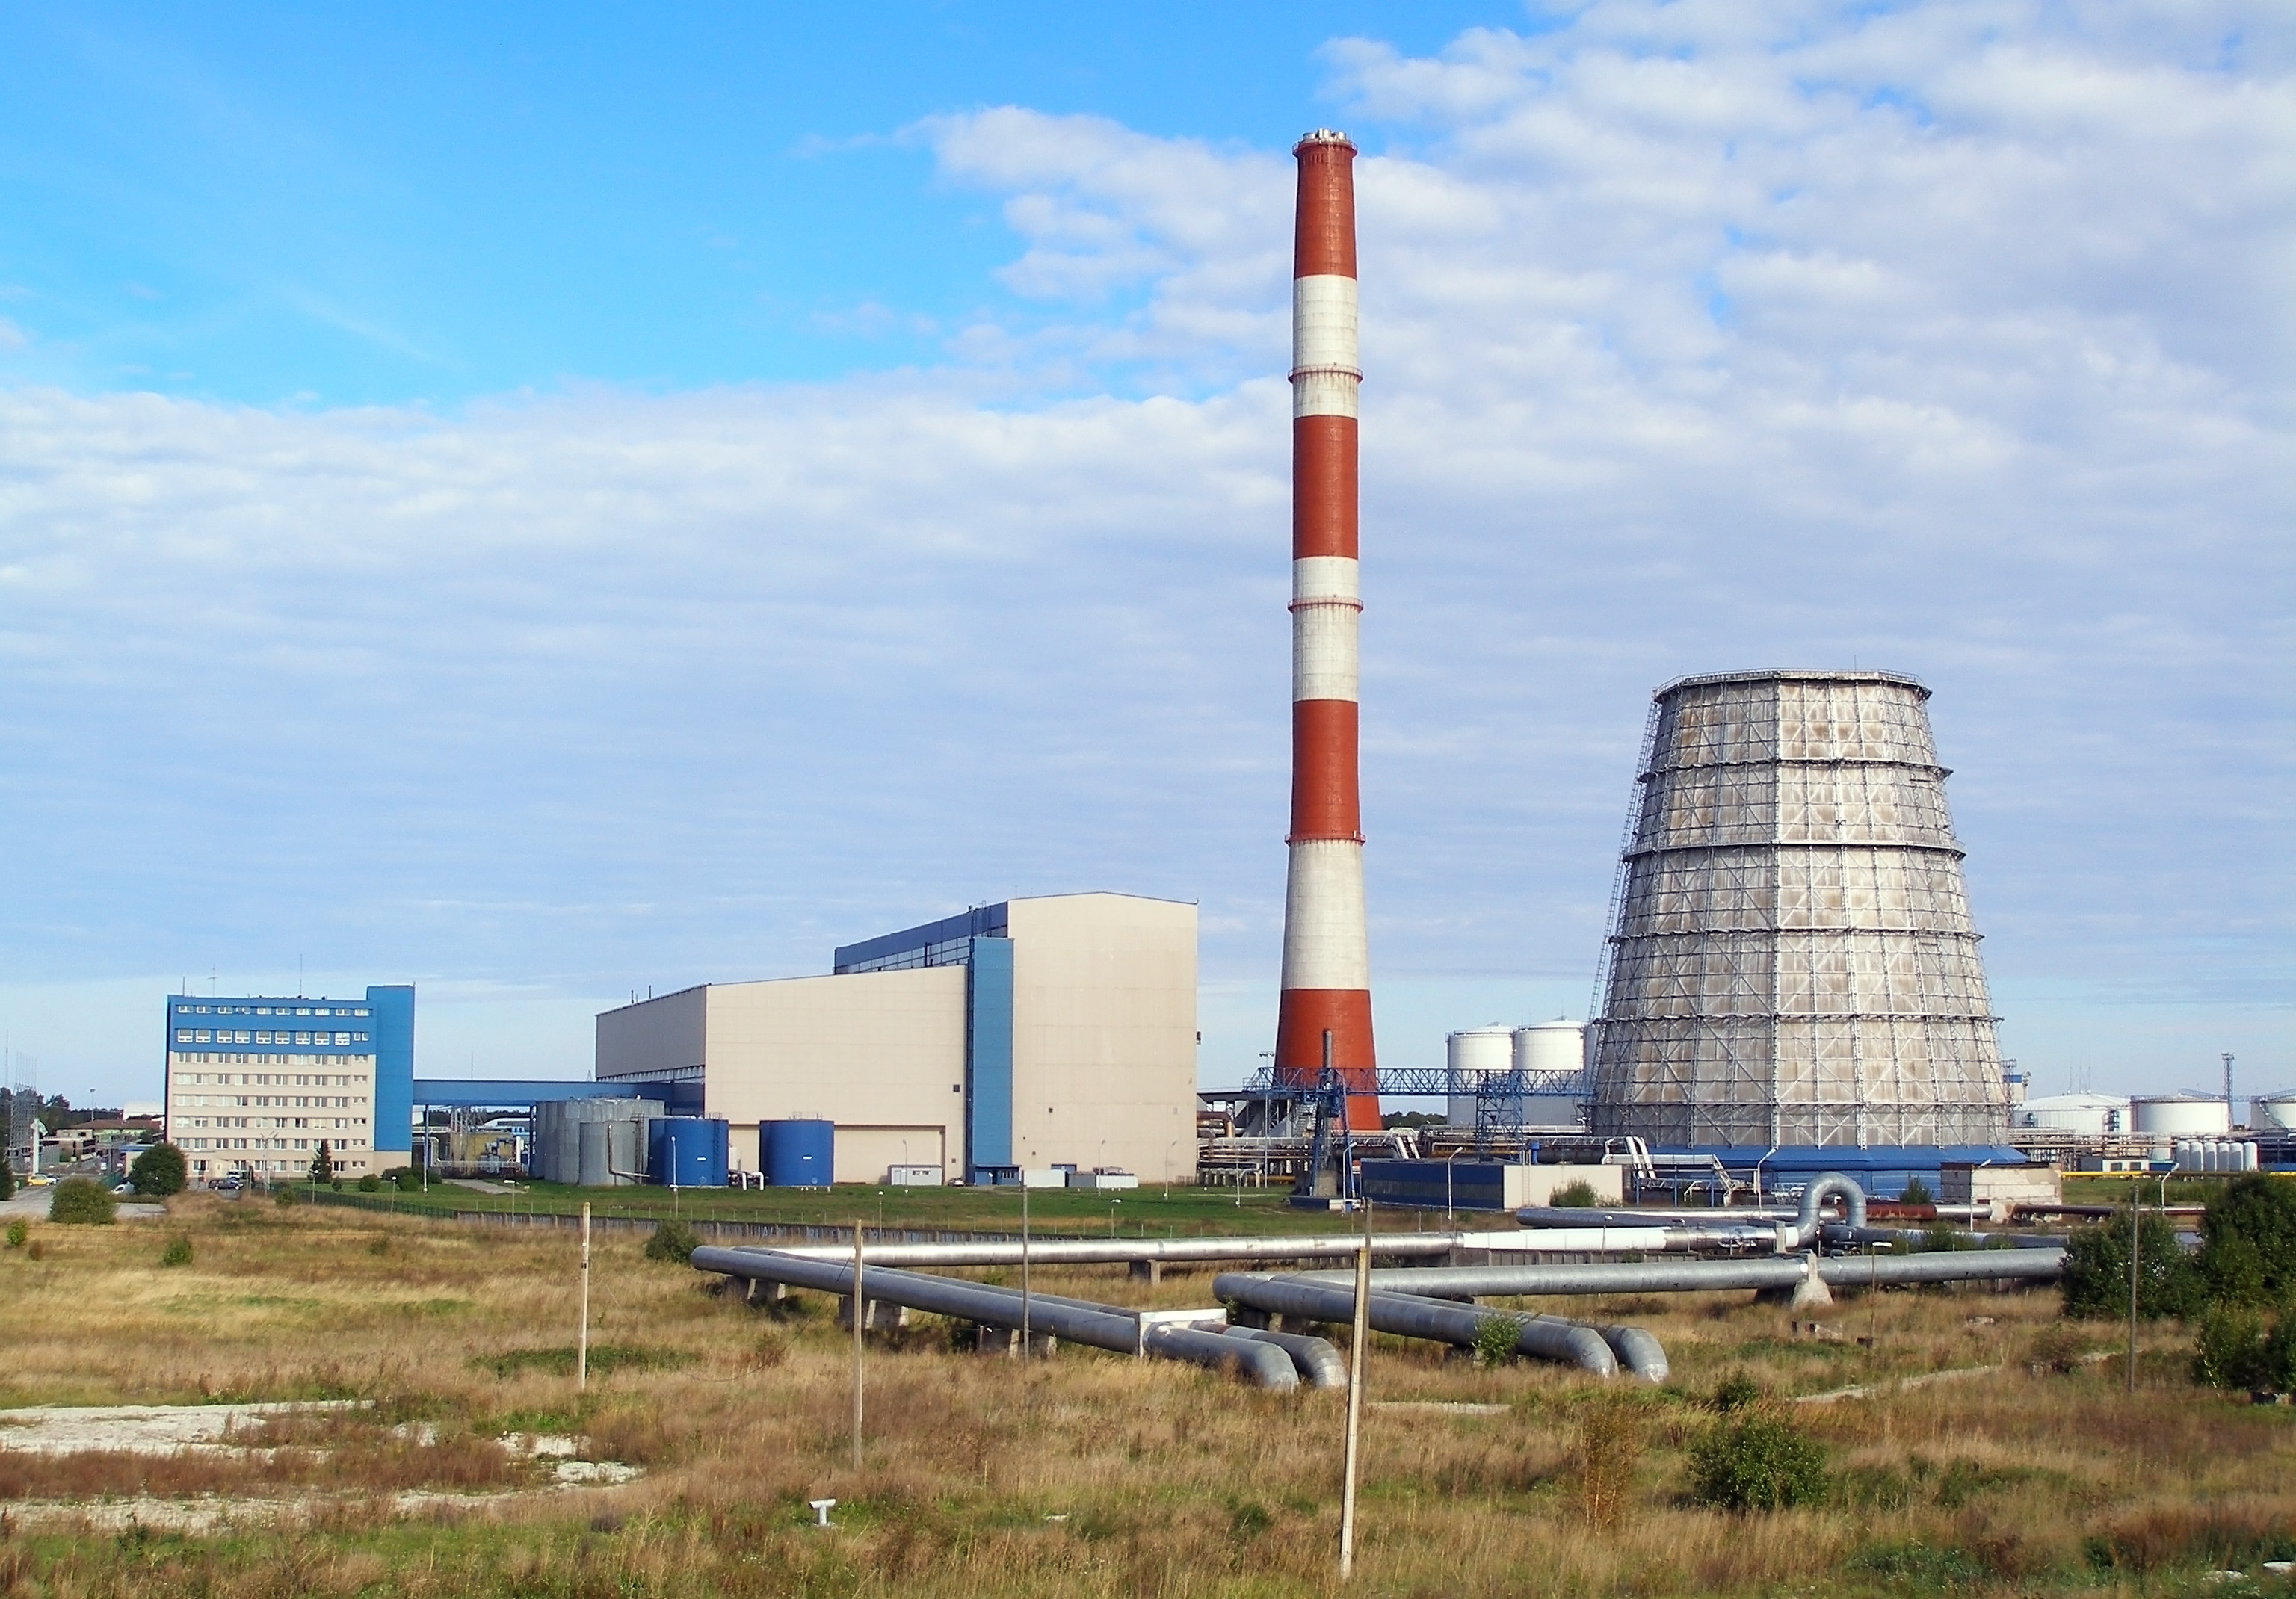 File:Iru power plant.jpg - Wikipedia